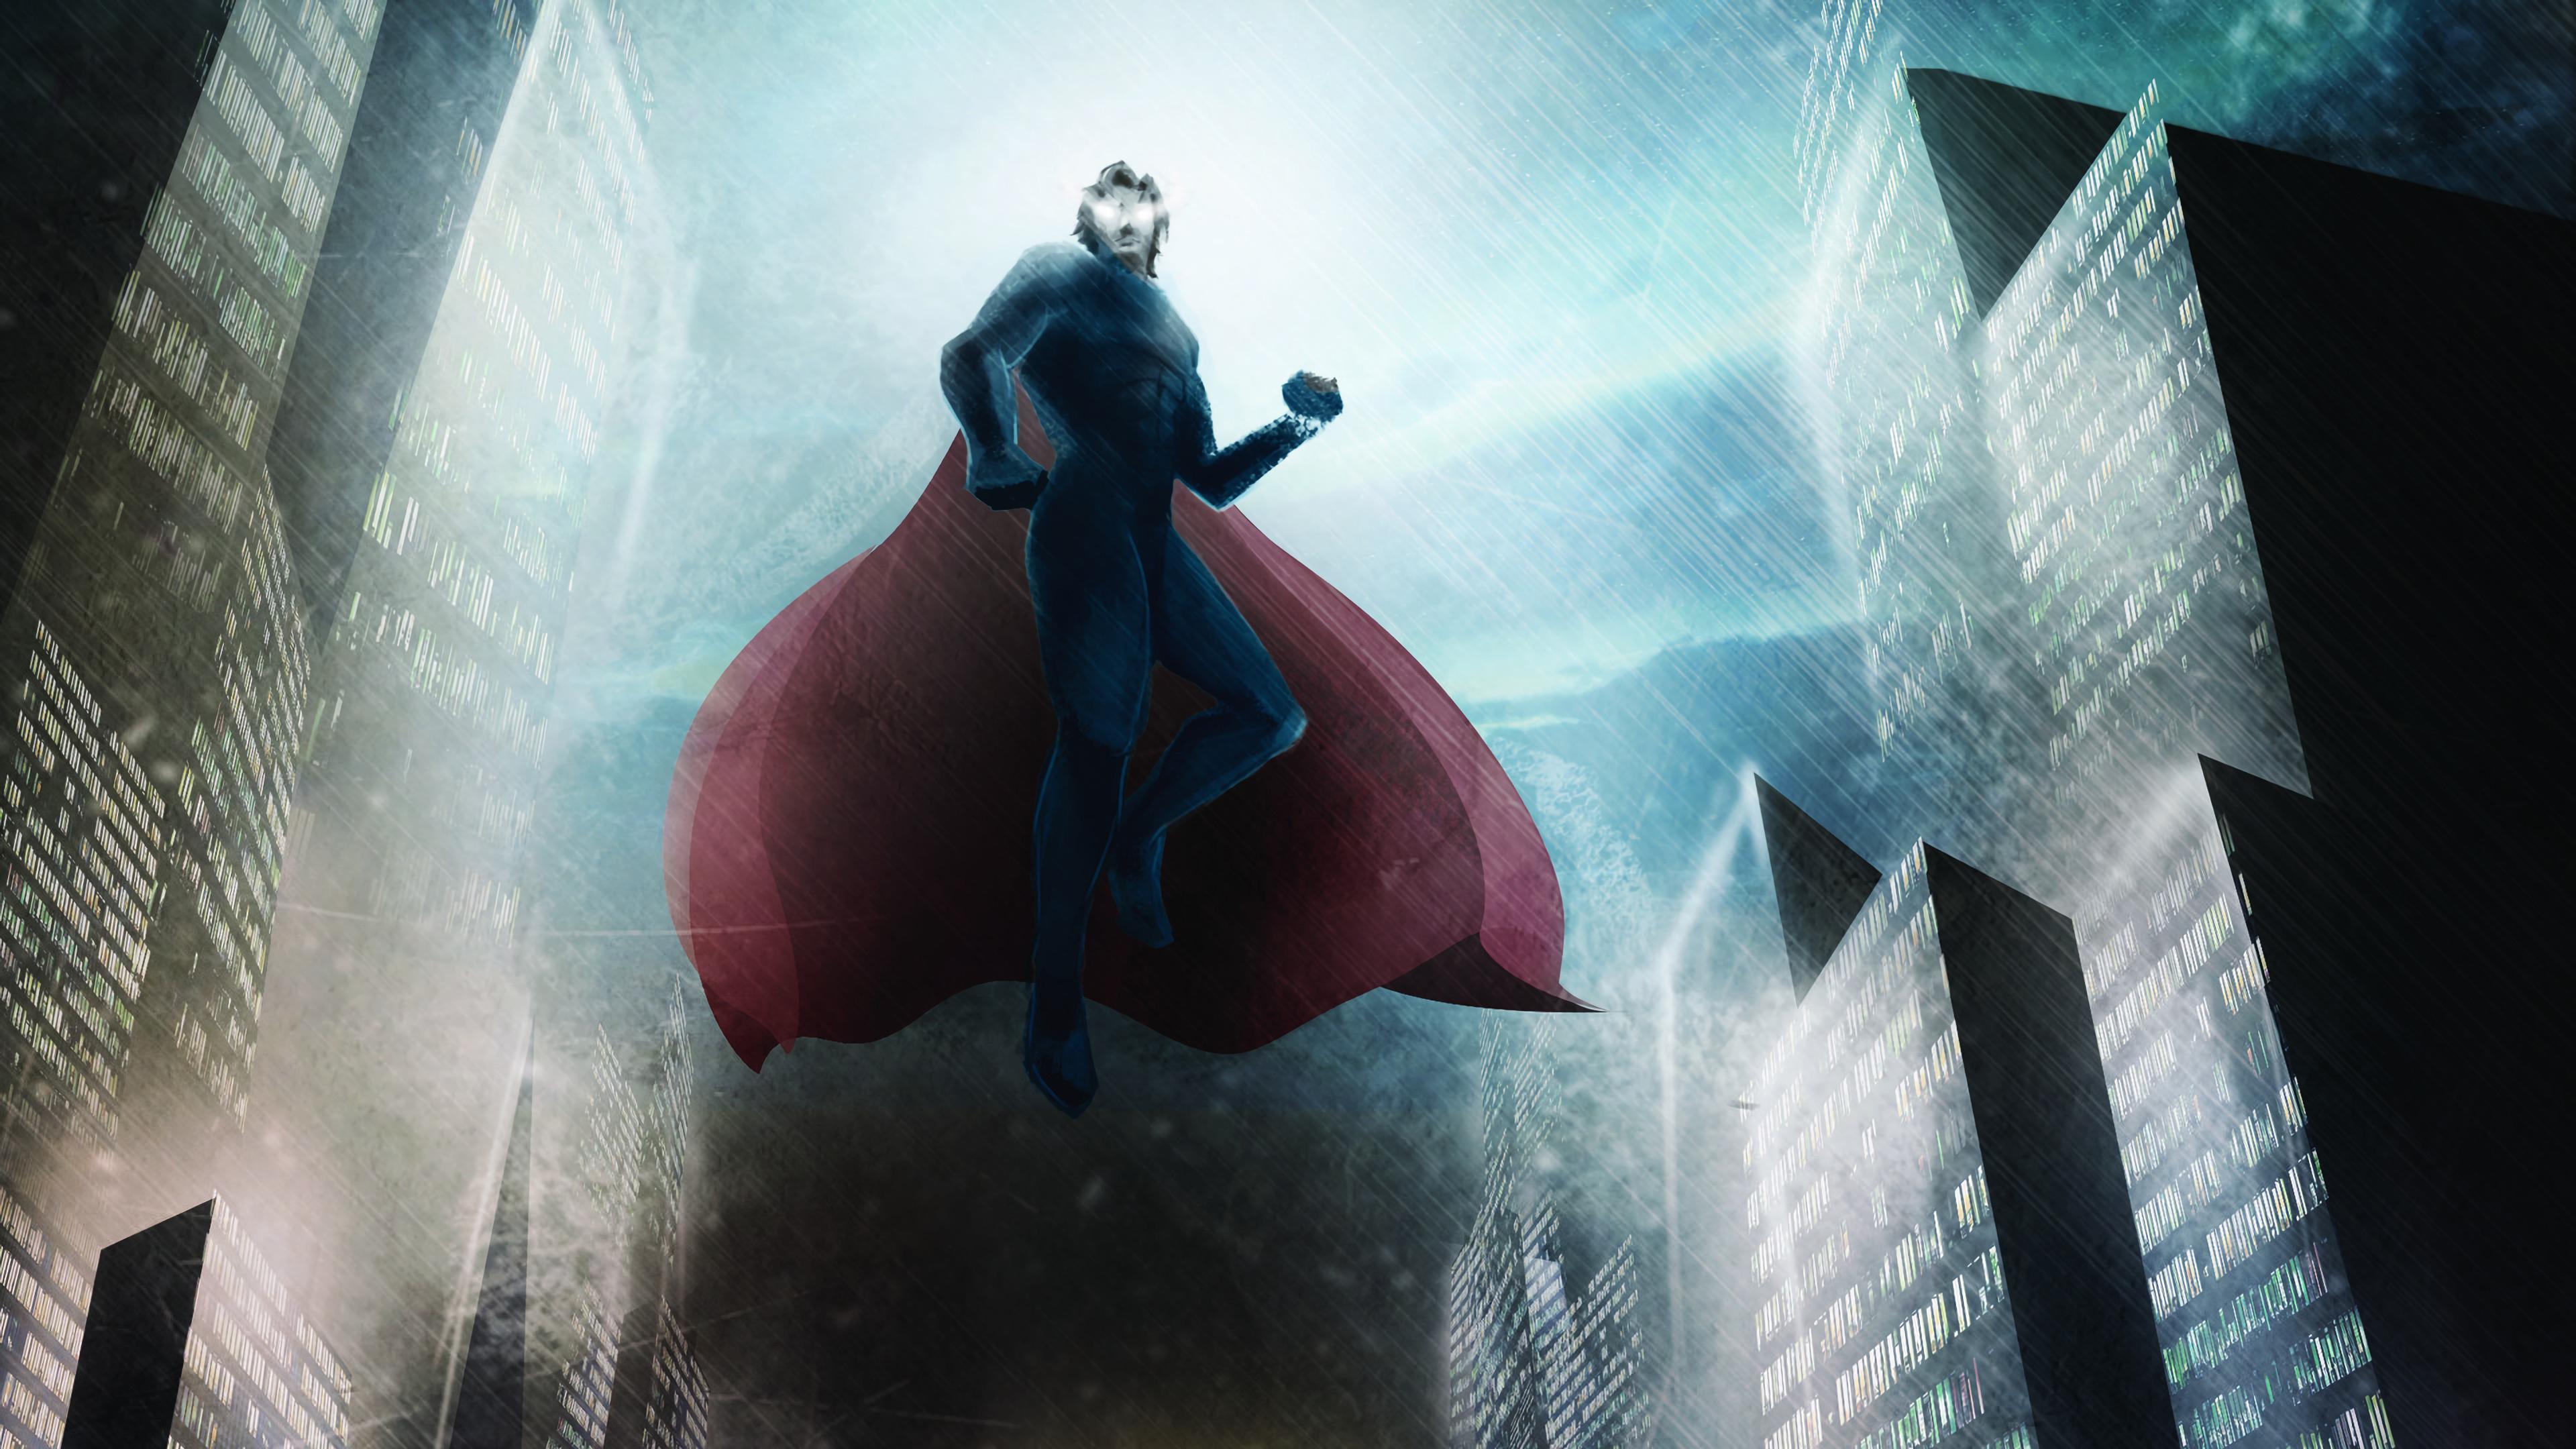 superman flying arts 1568054745 - Superman Flying Arts - superman wallpapers, superheroes wallpapers, hd-wallpapers, digital art wallpapers, artwork wallpapers, artstation wallpapers, 4k-wallpapers